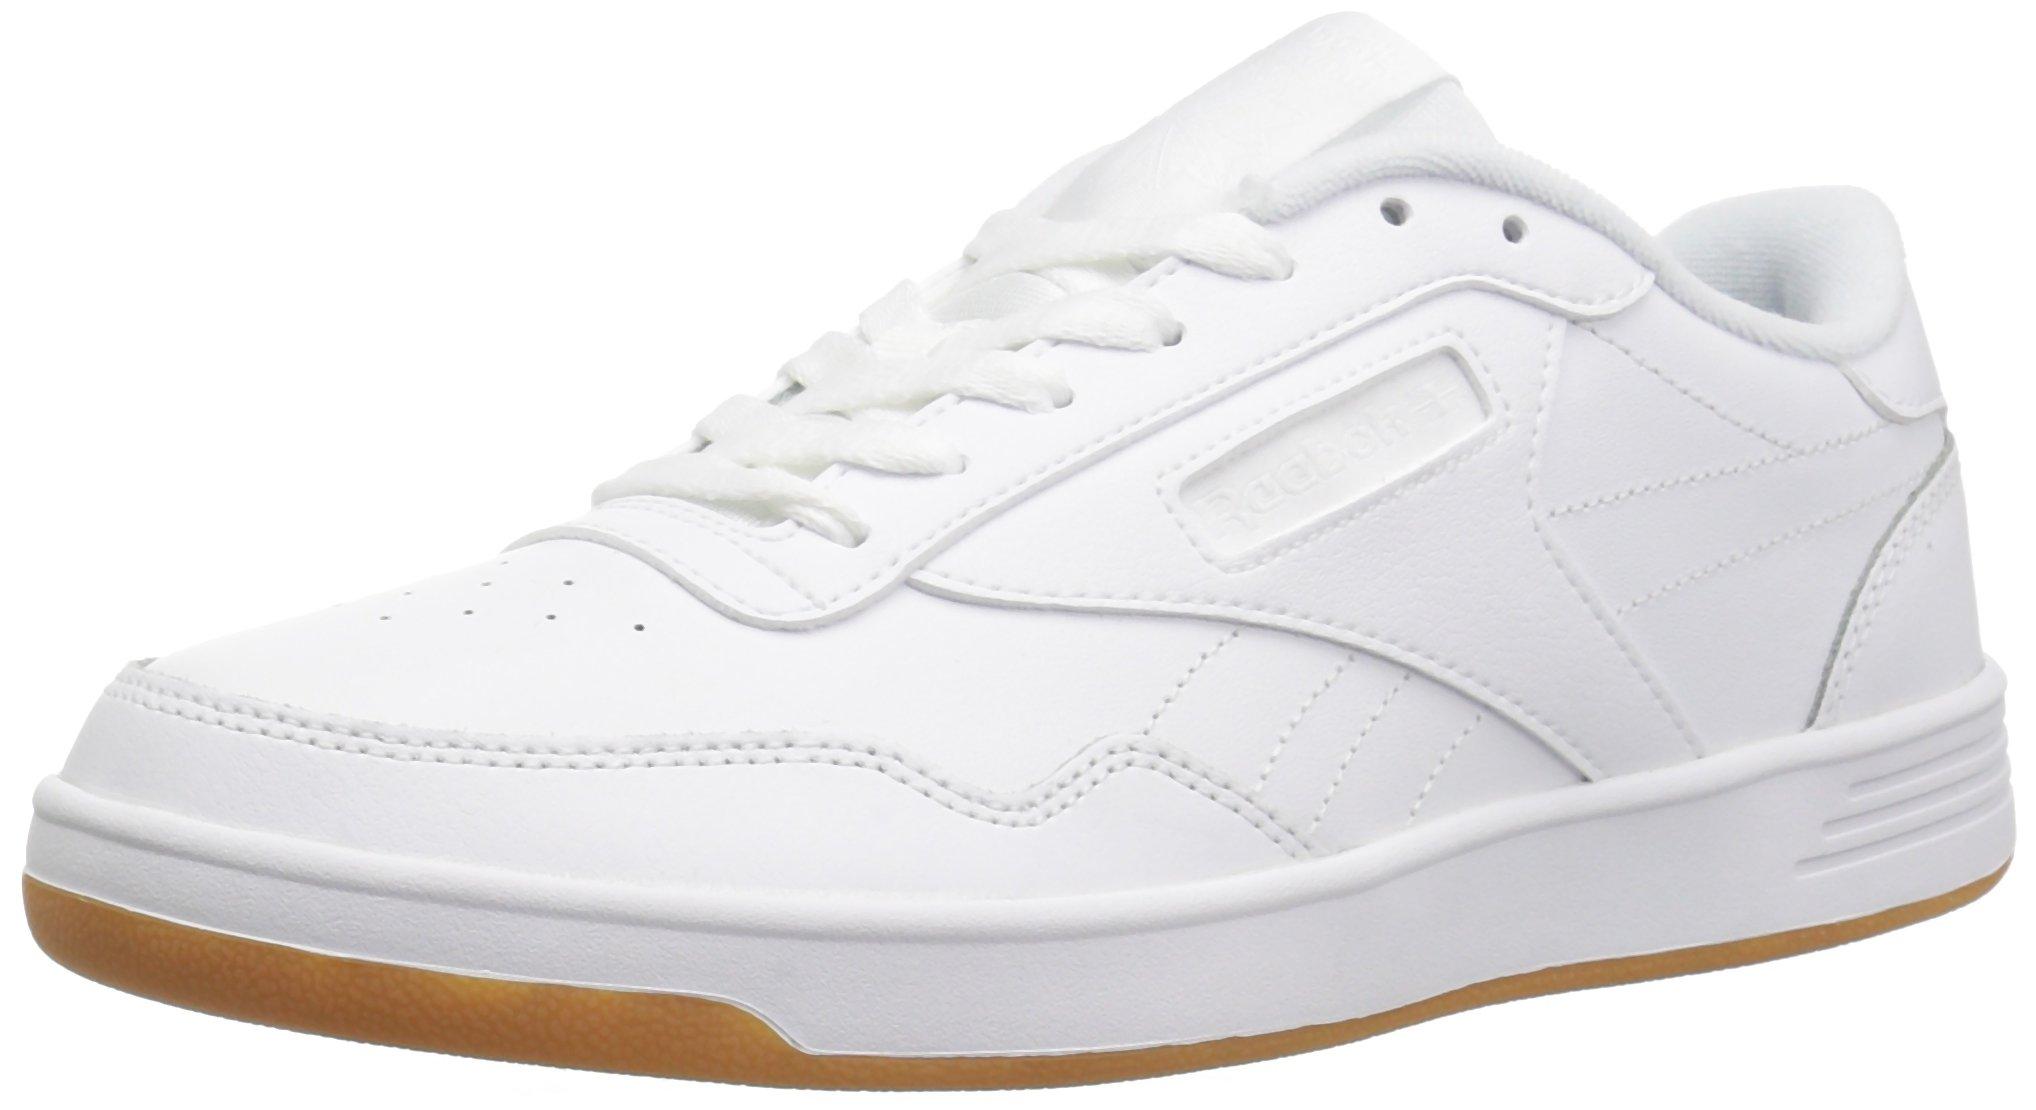 Reebok Women's Club MEMT Track Shoe,White/Gum,7 M US